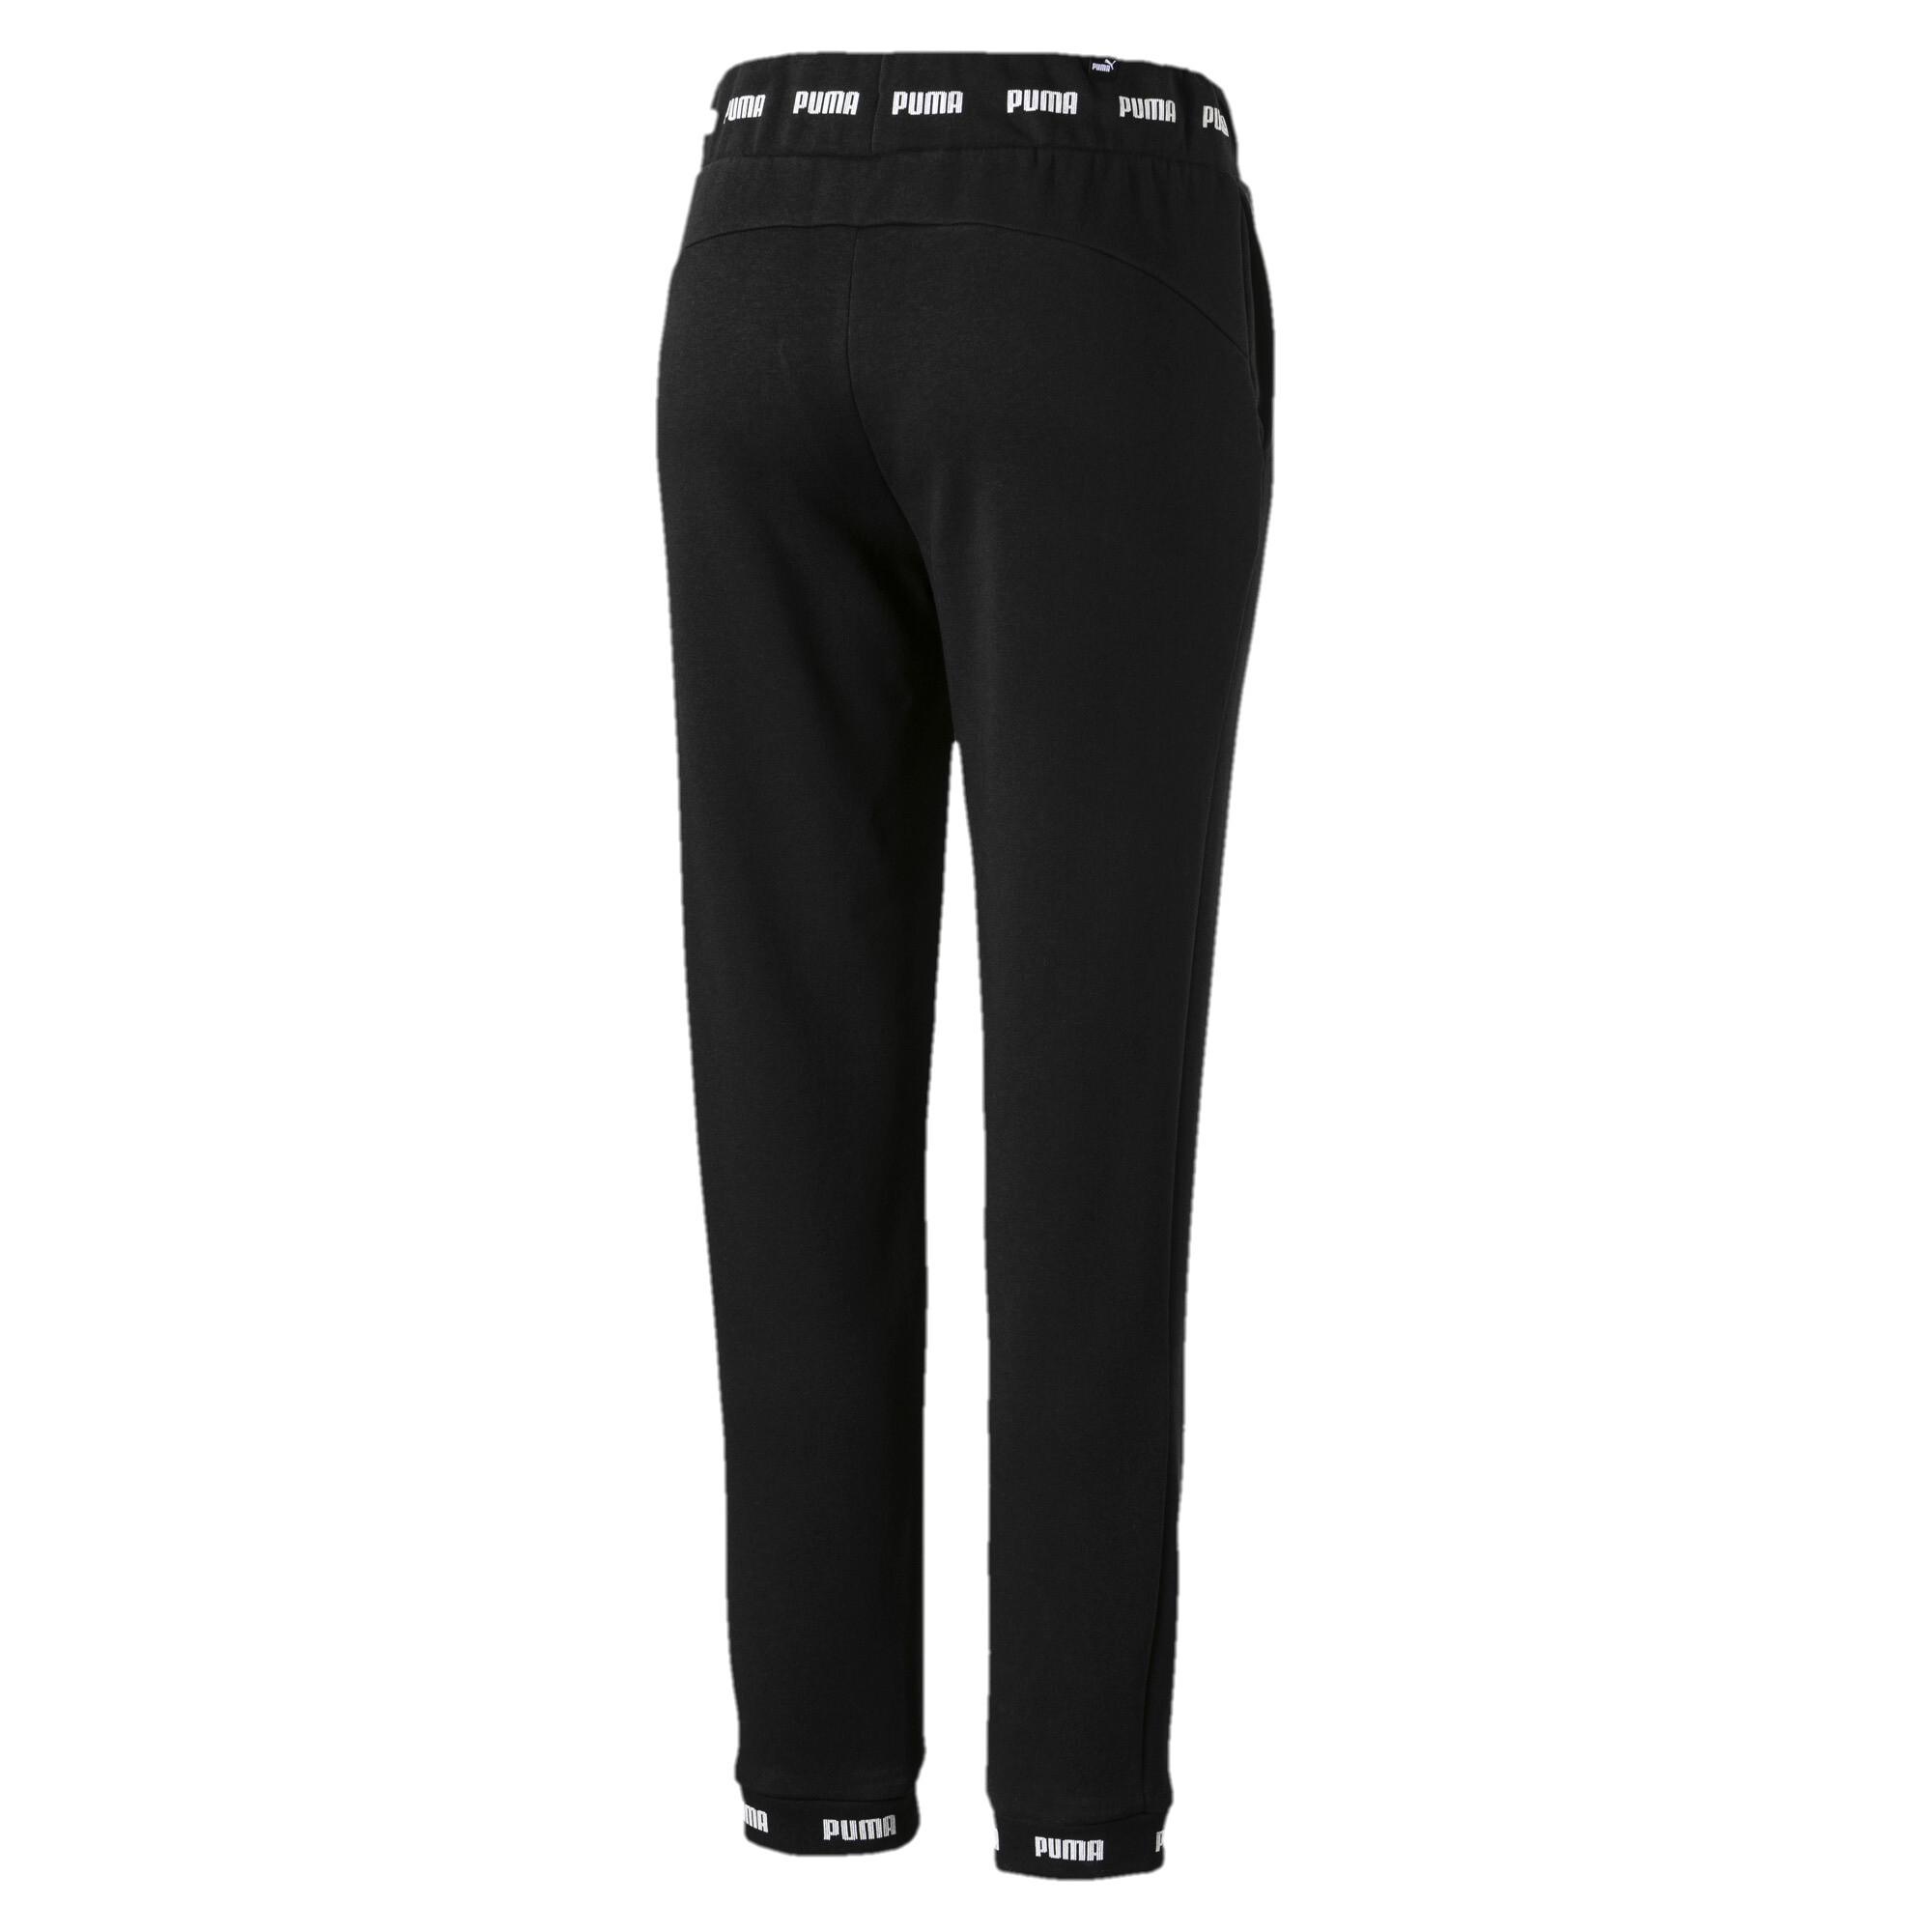 Image Puma Amplified Knitted Women's Sweatpants #5